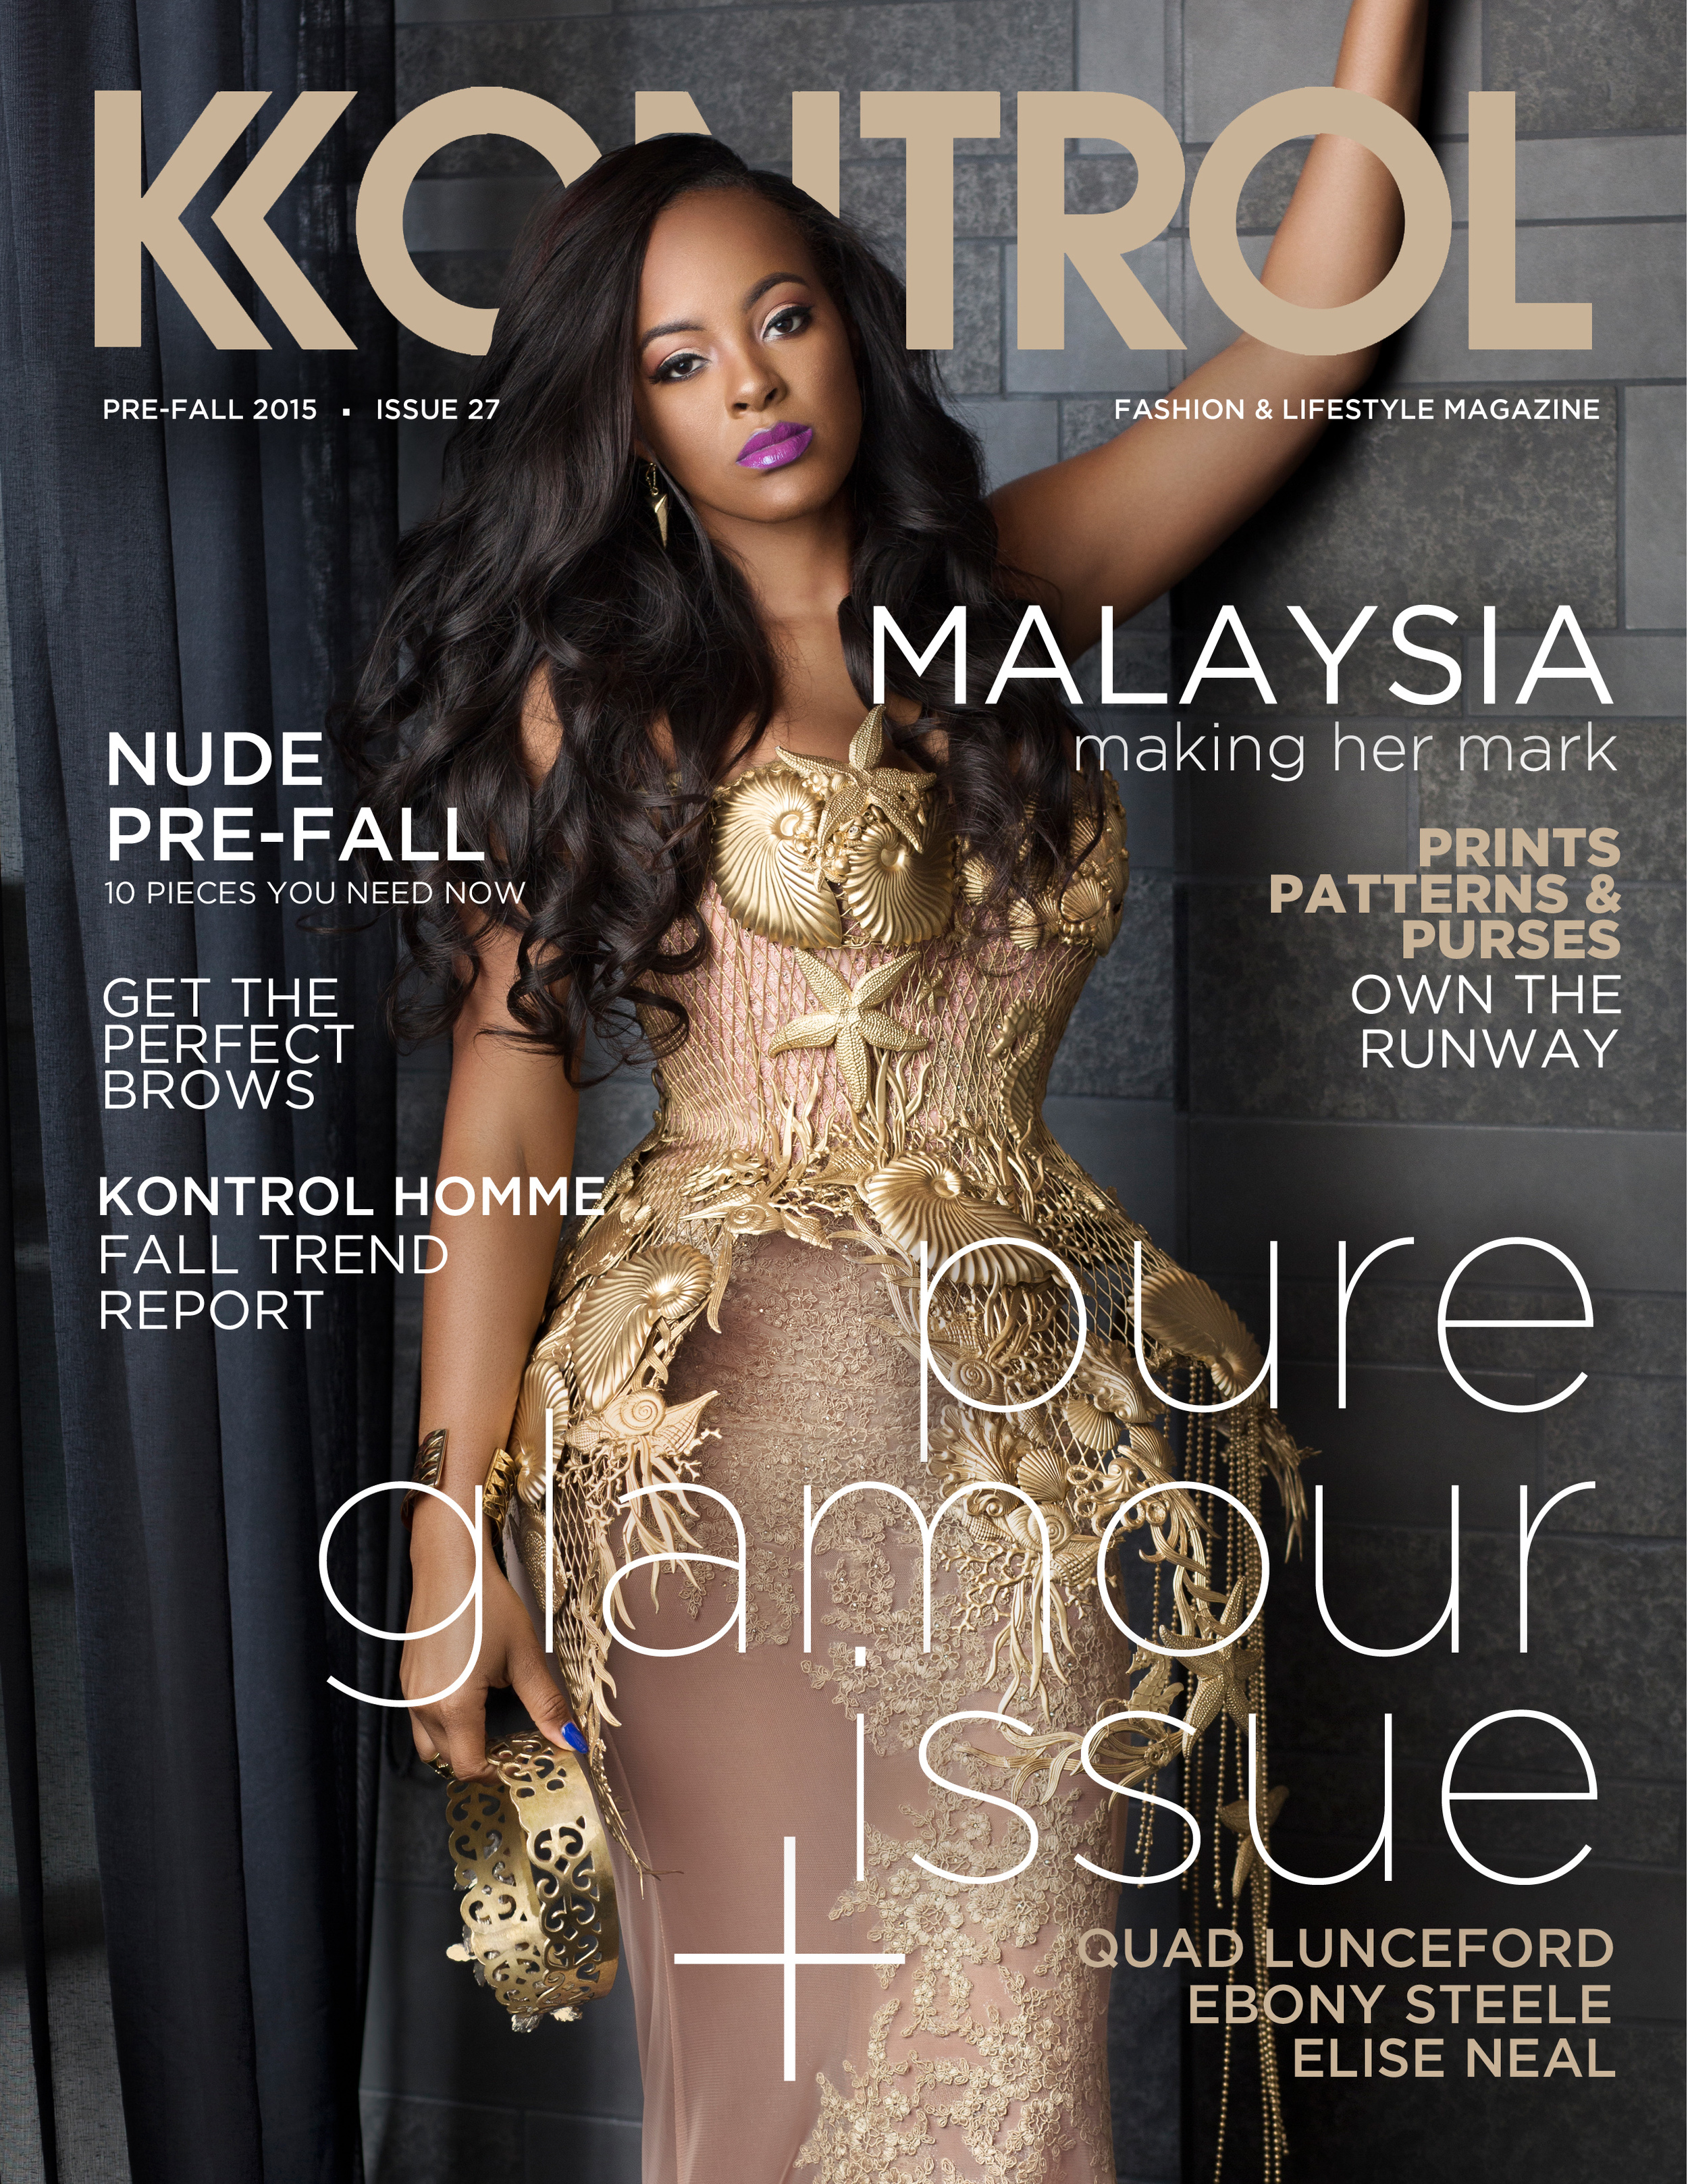 Malaysia Cover.jpg